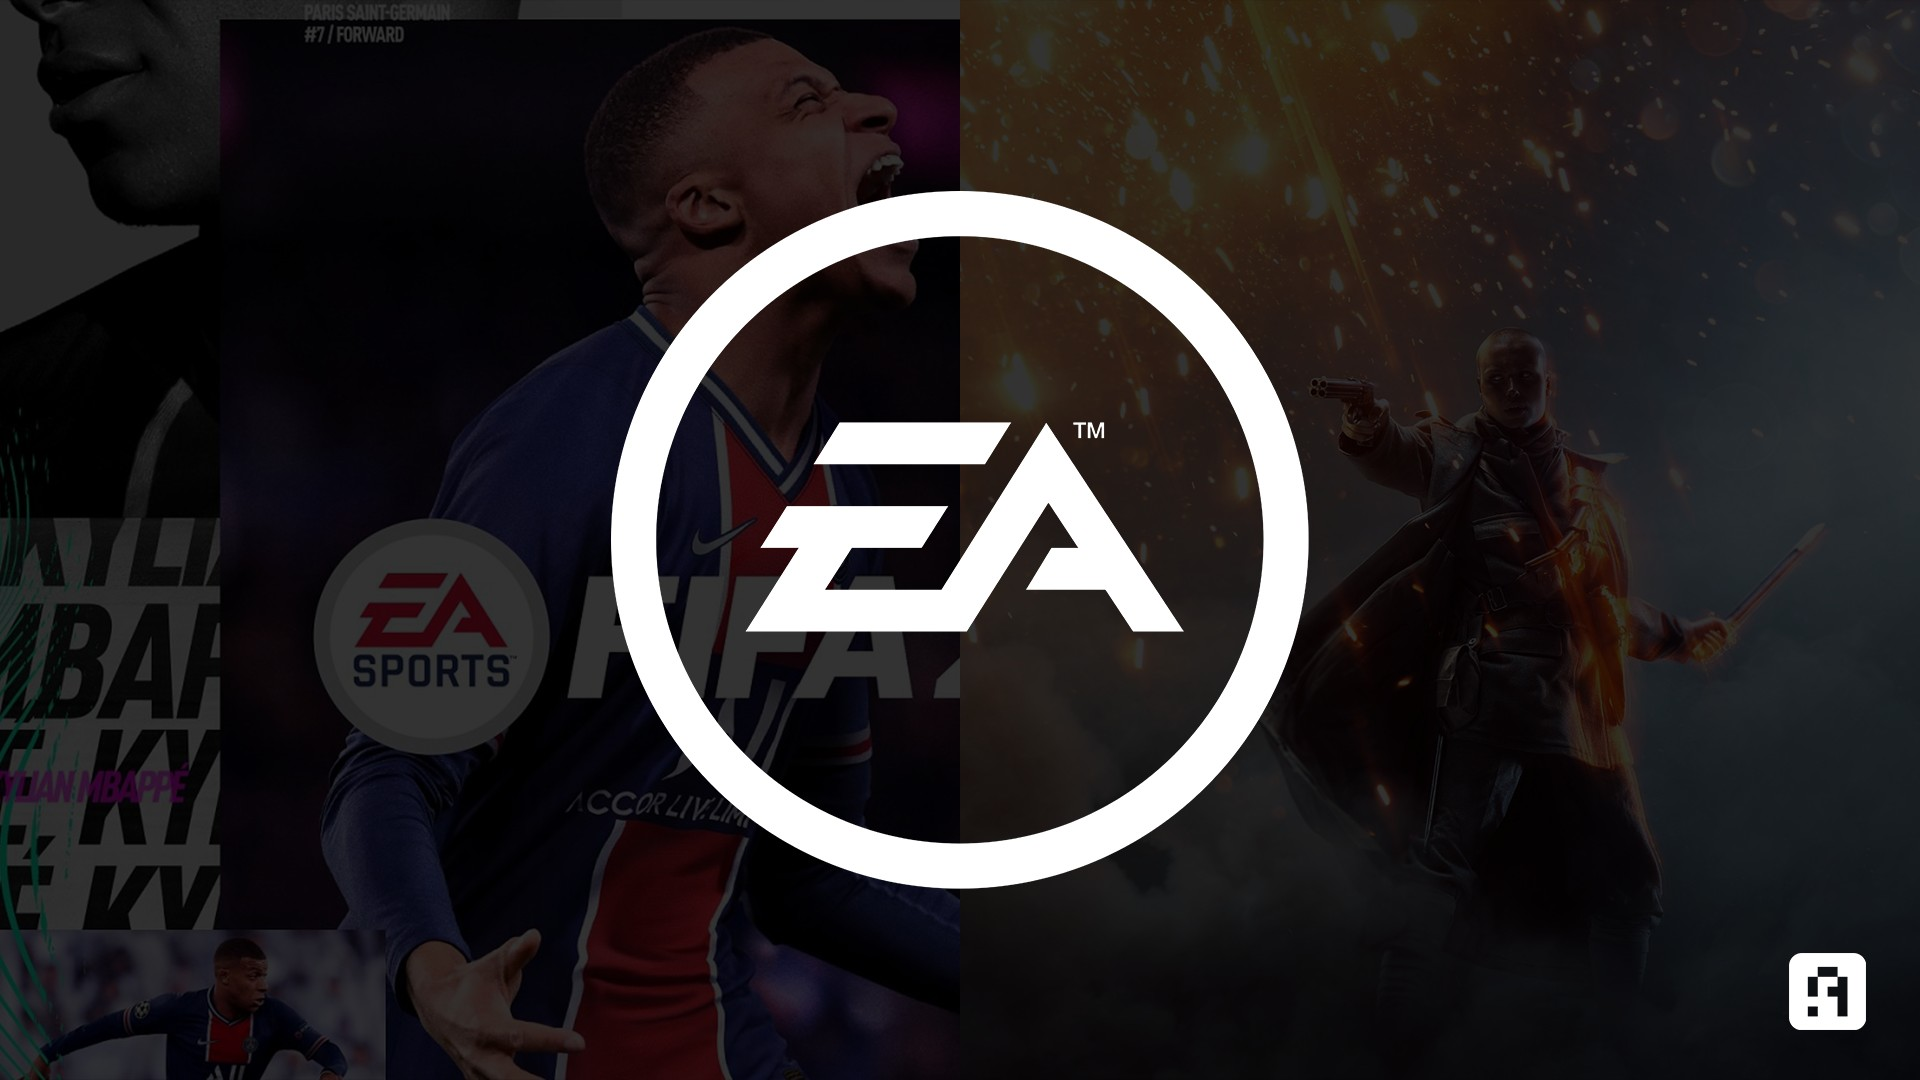 EA sports - Arabhardware Generic Photos